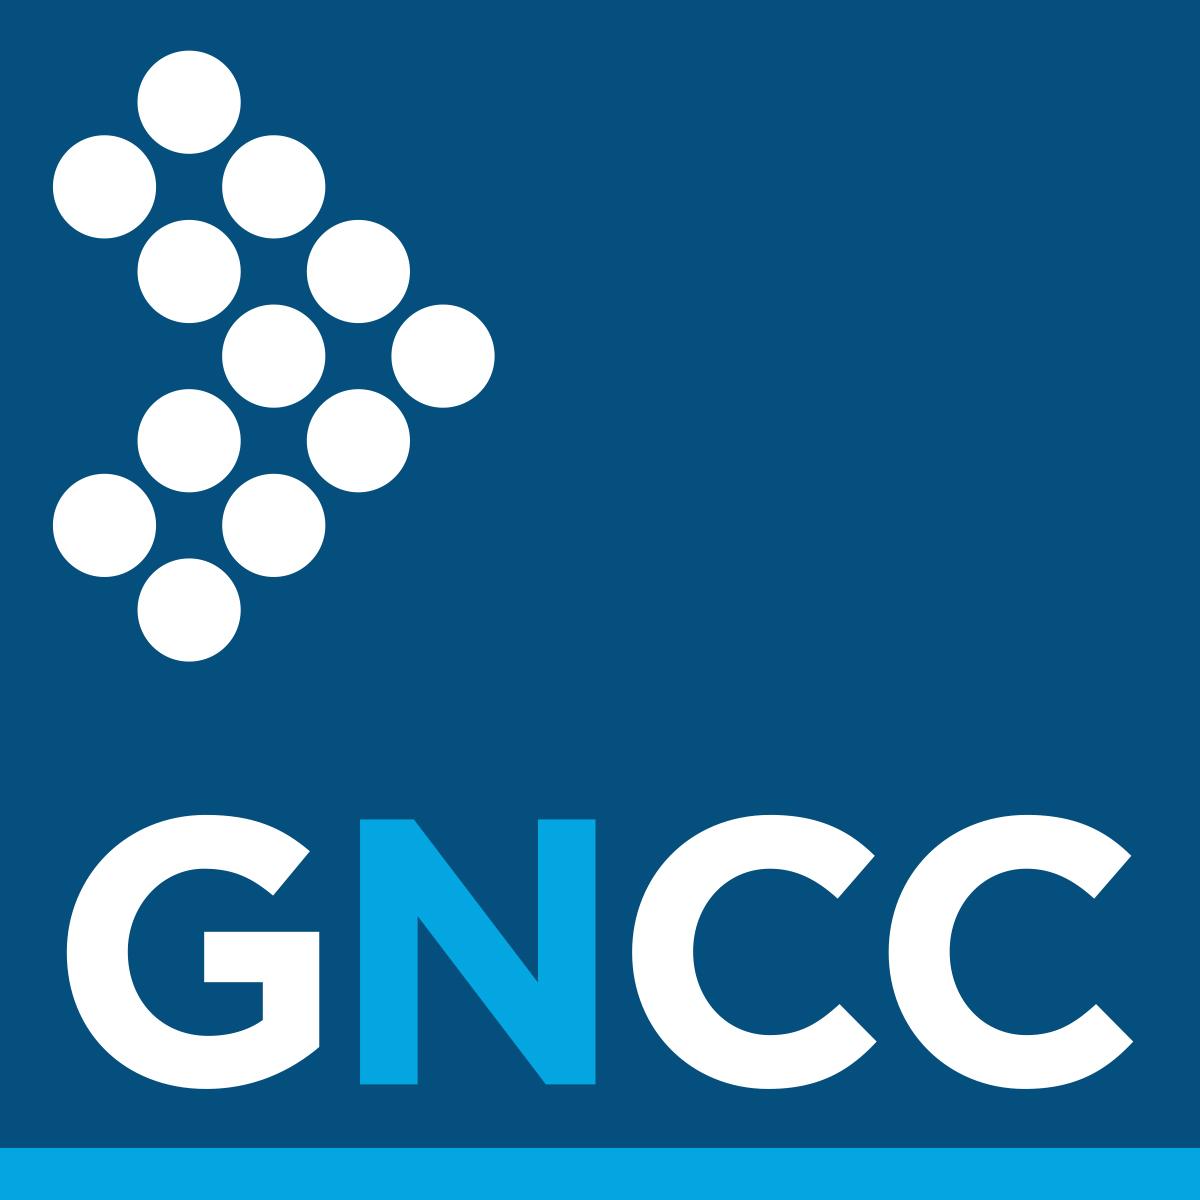 GNCC_Sml-Use1